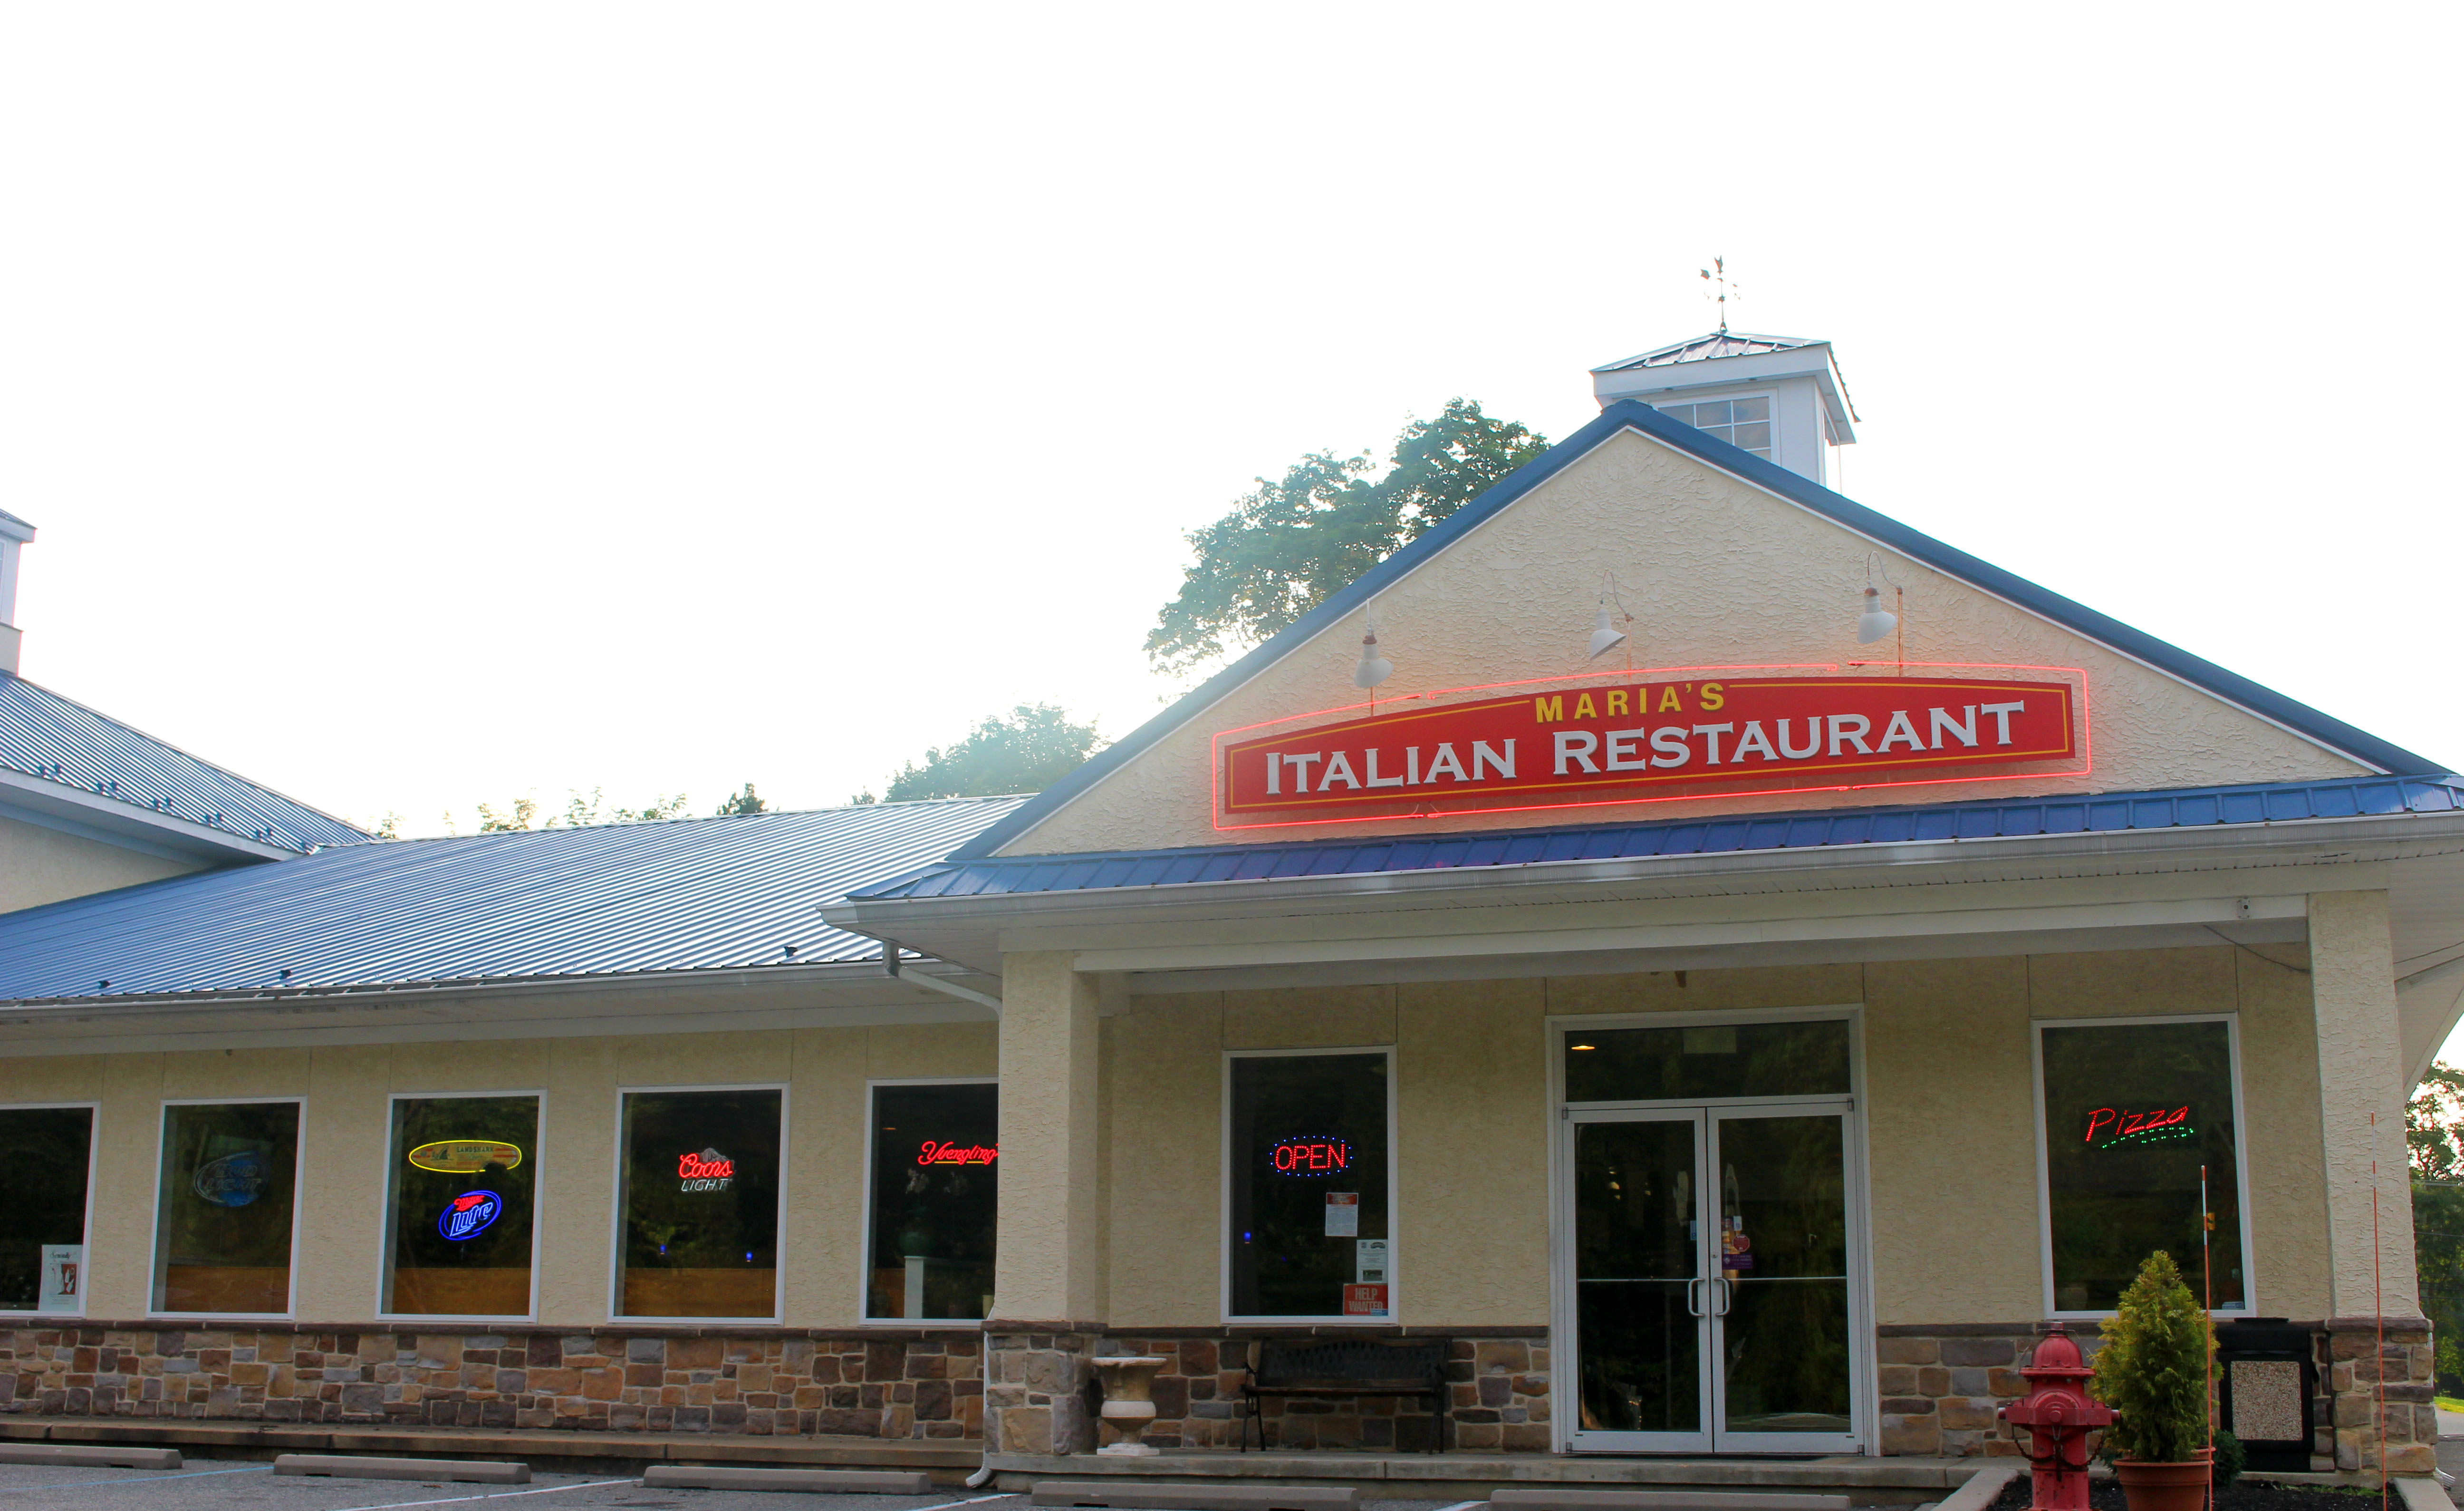 Maria S Pizza Marias Italian Restaurant 2525 Augustine Herman Hwy Ste A Chesapeake City Md 21915 Yp